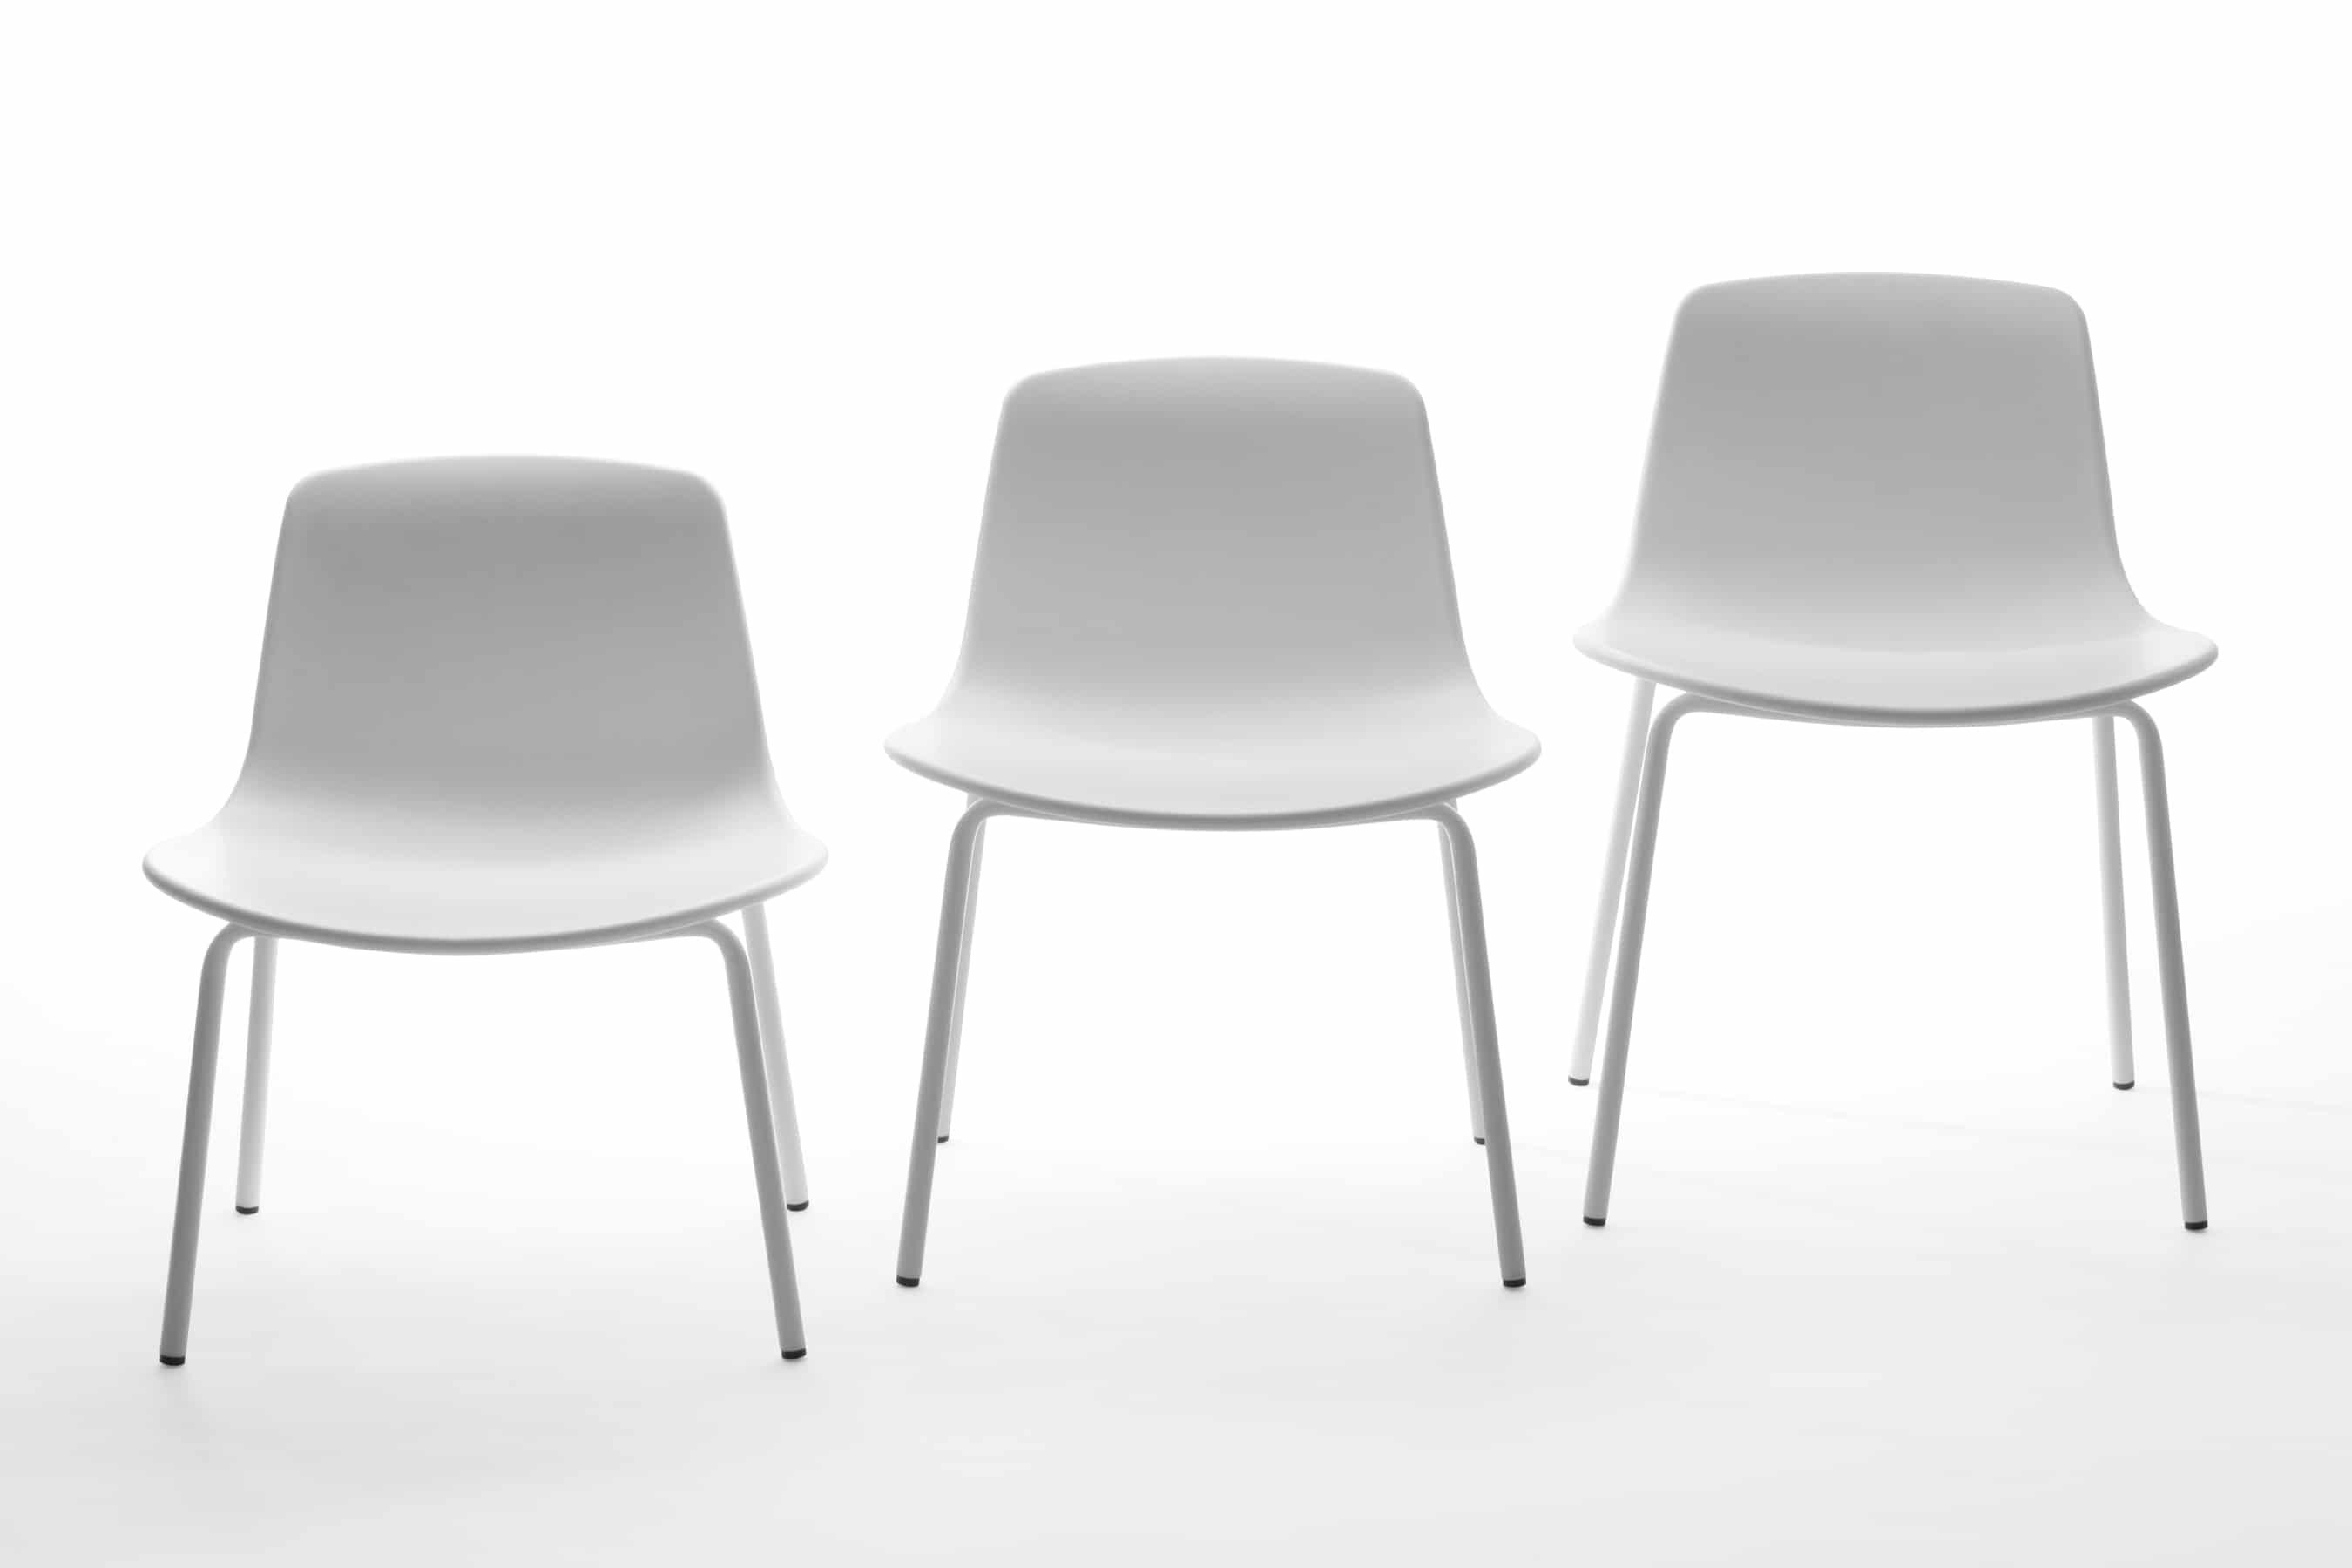 Lottus chair